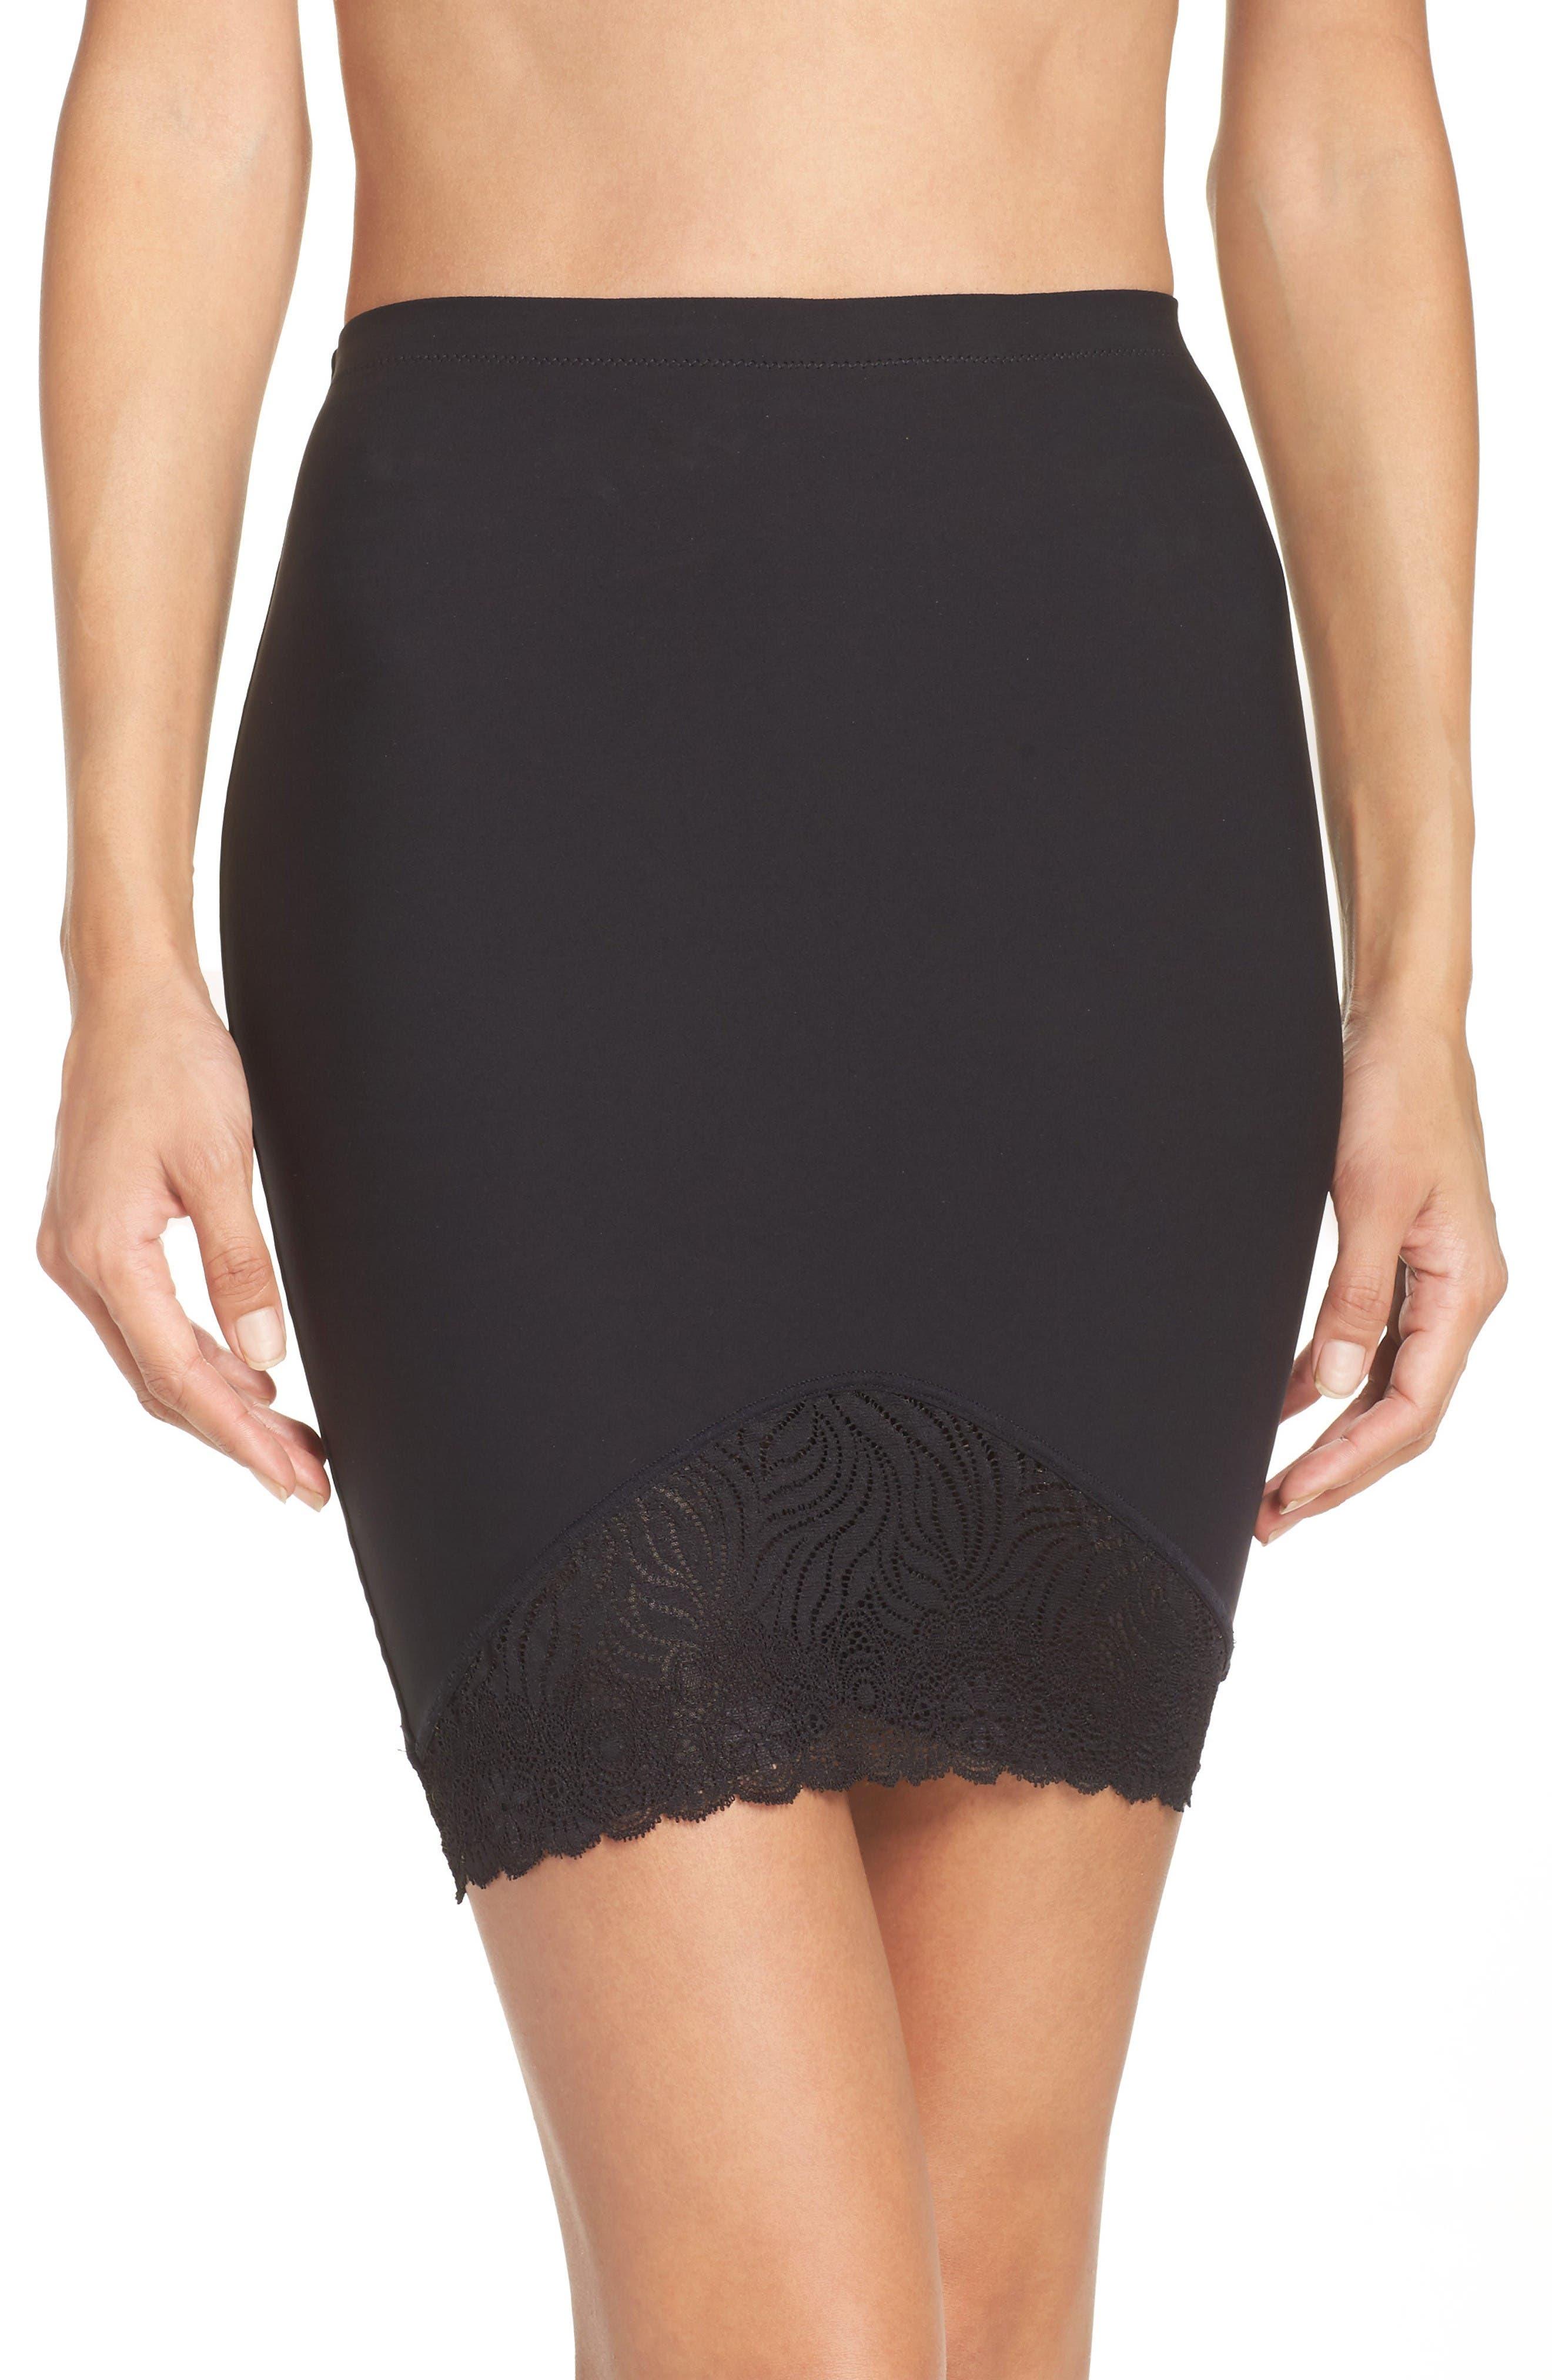 Top Model High Waist Skirt Shaper,                             Main thumbnail 1, color,                             Black